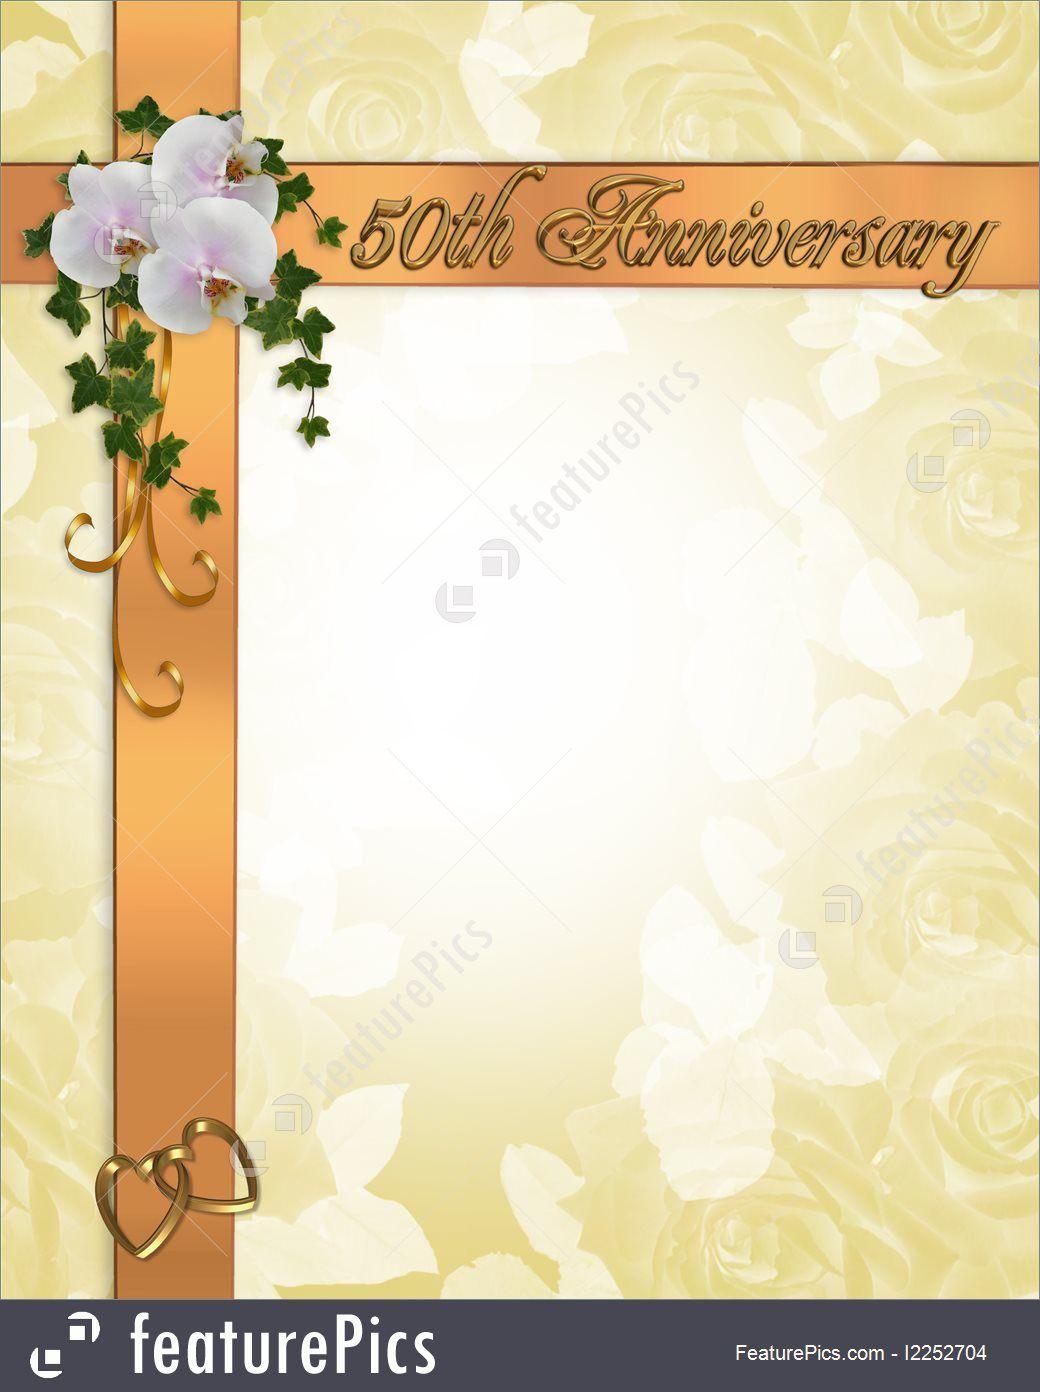 000 Stirring 50th Anniversary Invitation Card Template Design  Templates FreeFull